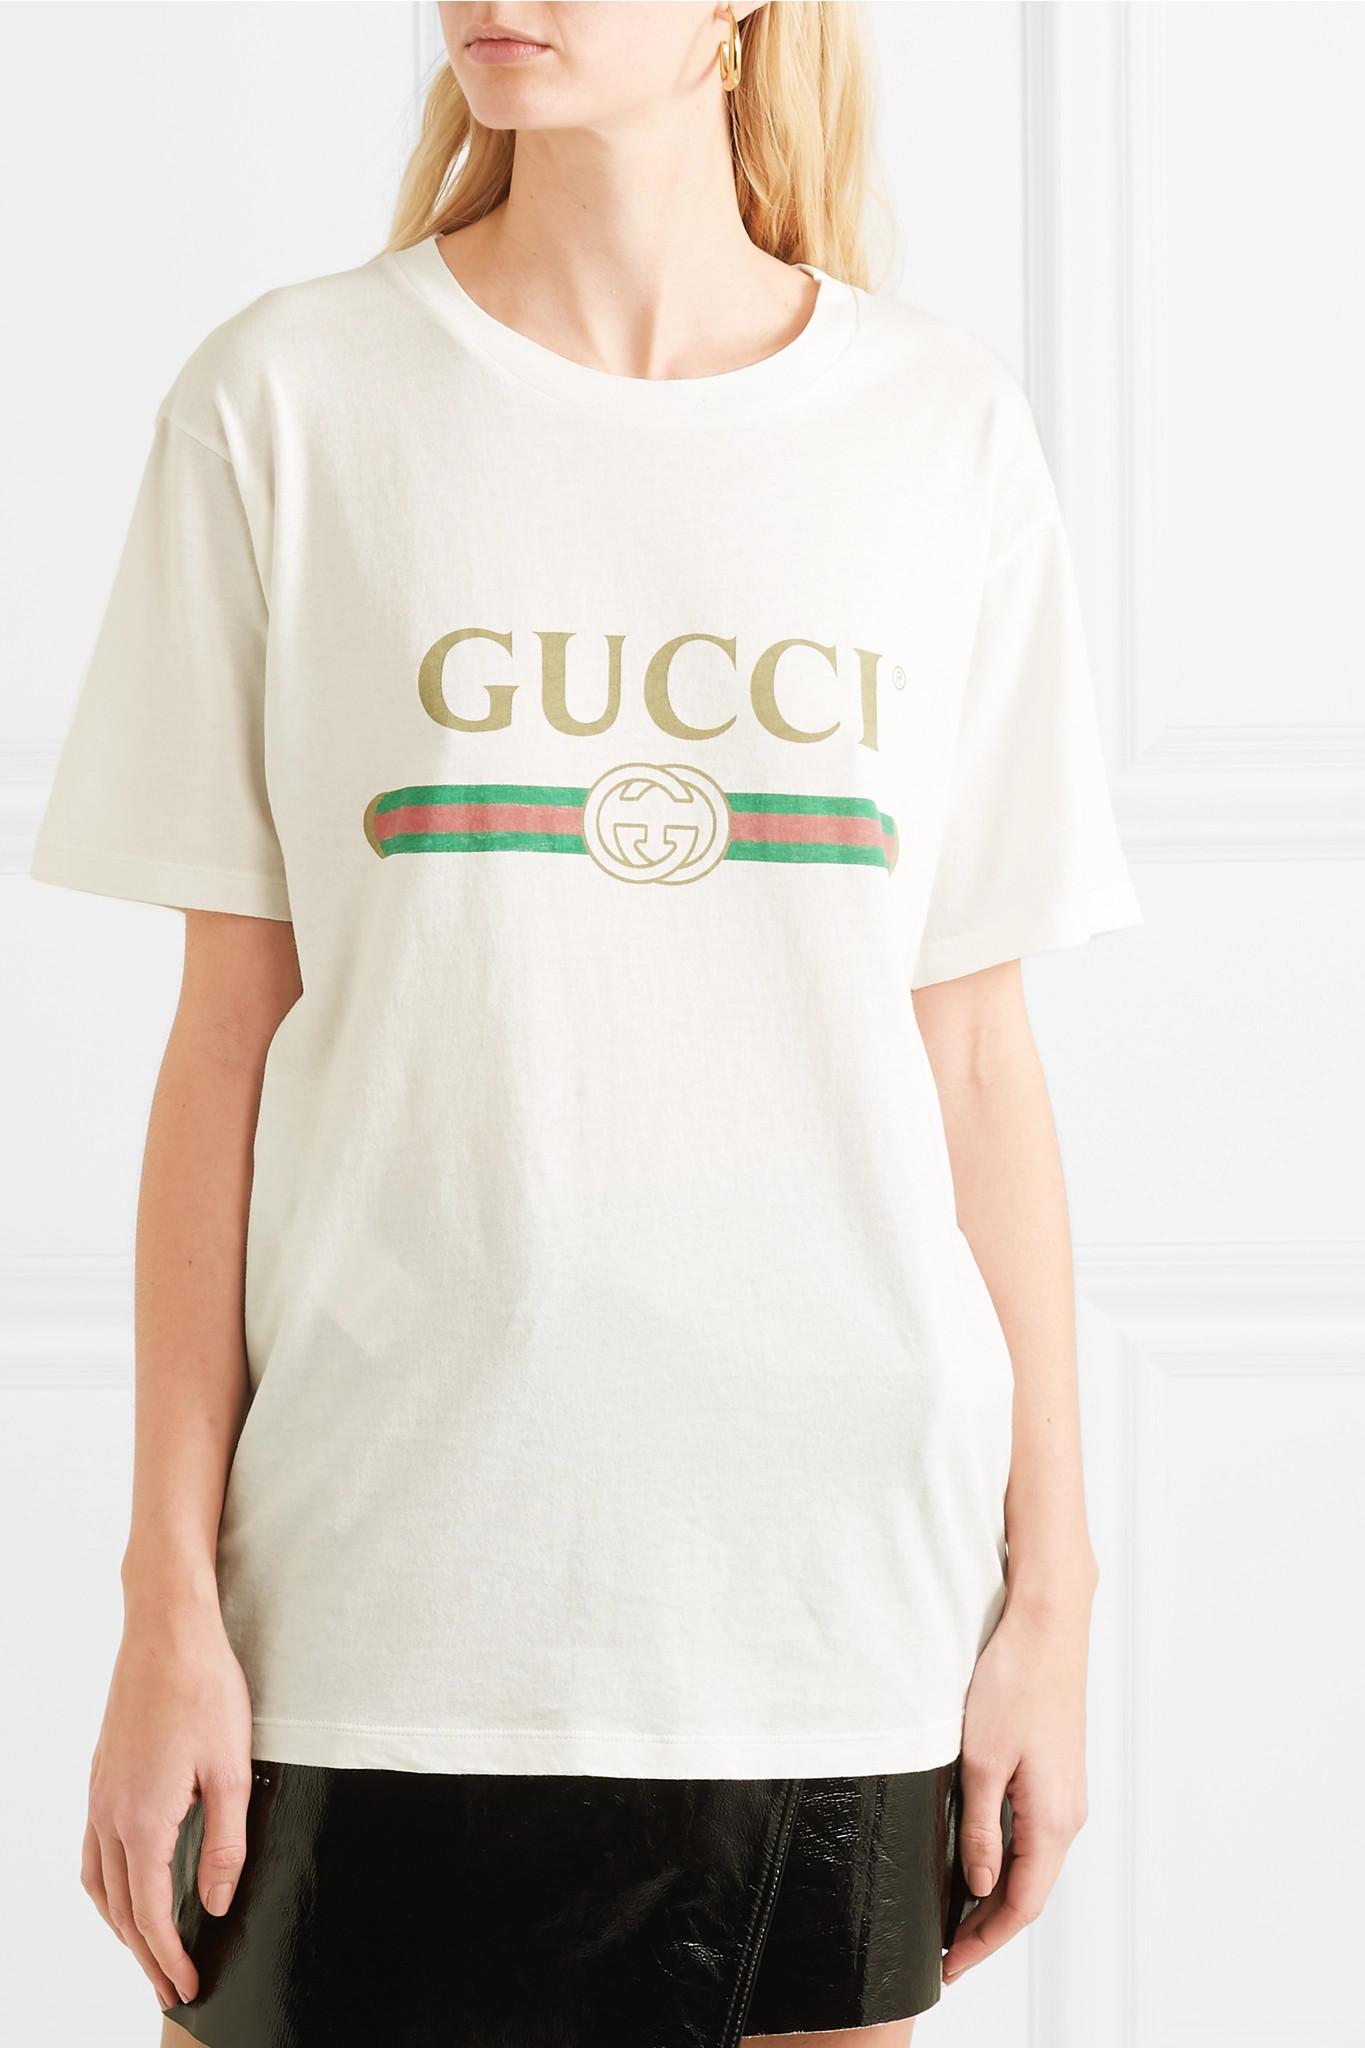 4e61fc52bf58 Gucci - White Appliquéd Distressed Printed Cotton-jersey T-shirt - Lyst.  View fullscreen